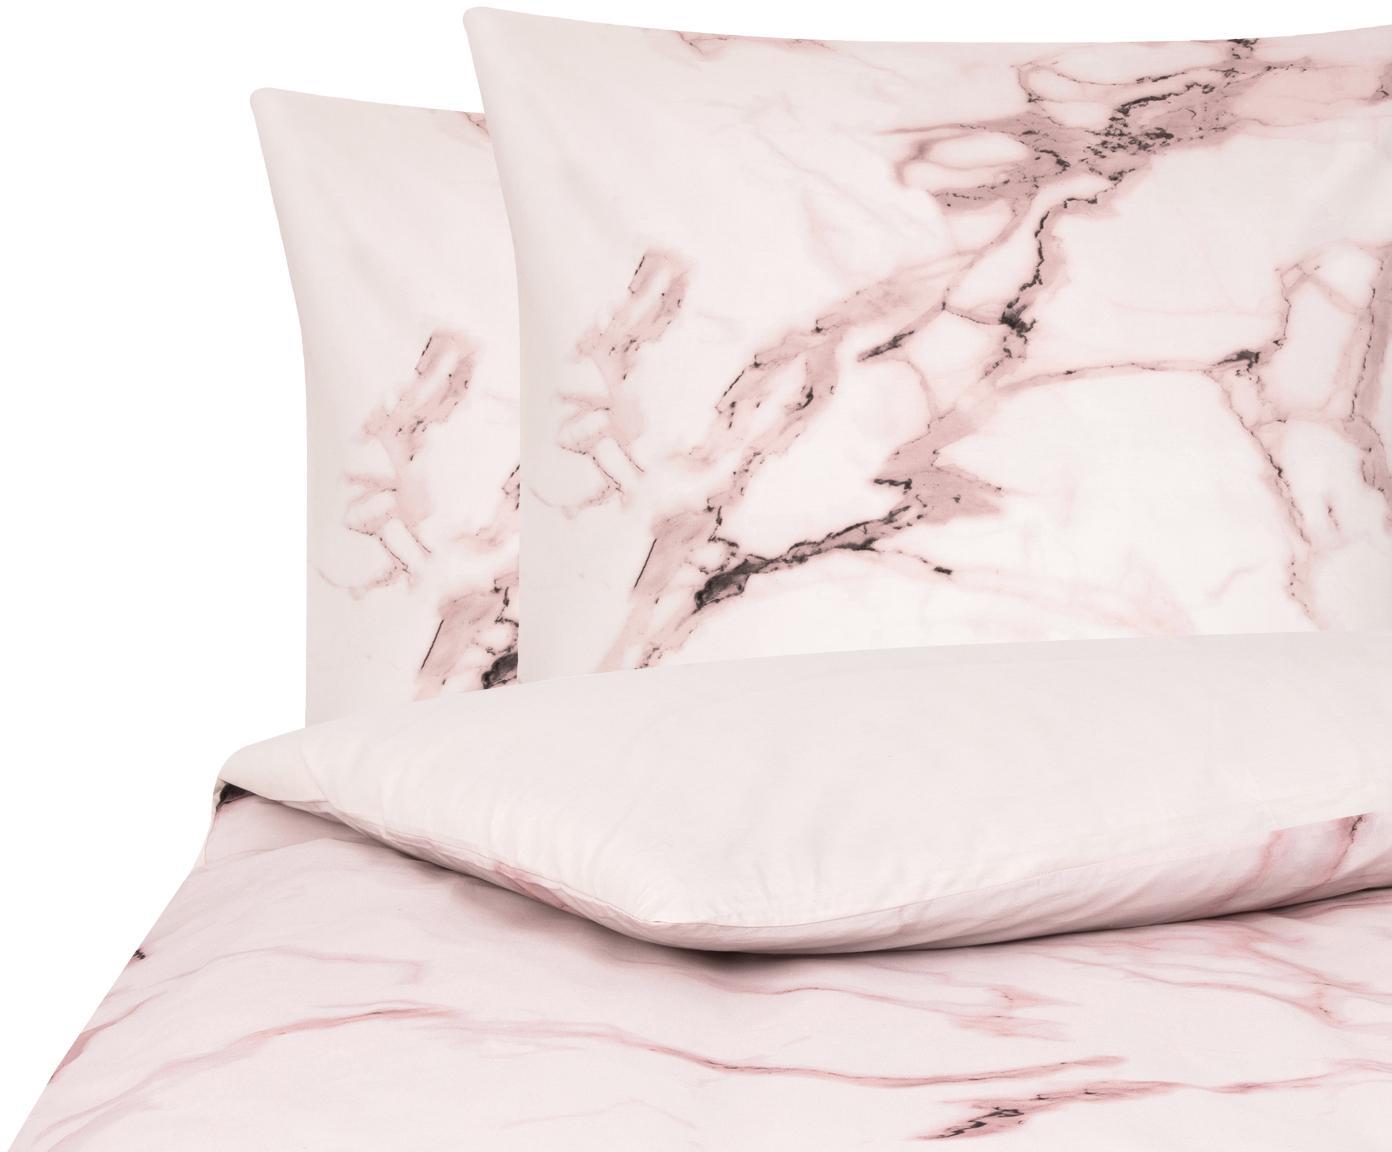 Baumwollperkal-Bettwäsche Malin mit Marmor-Muster, Webart: Perkal Fadendichte 200 TC, Marmormuster, Rosa, 200 x 200 cm + 2 Kissen 80 x 80 cm